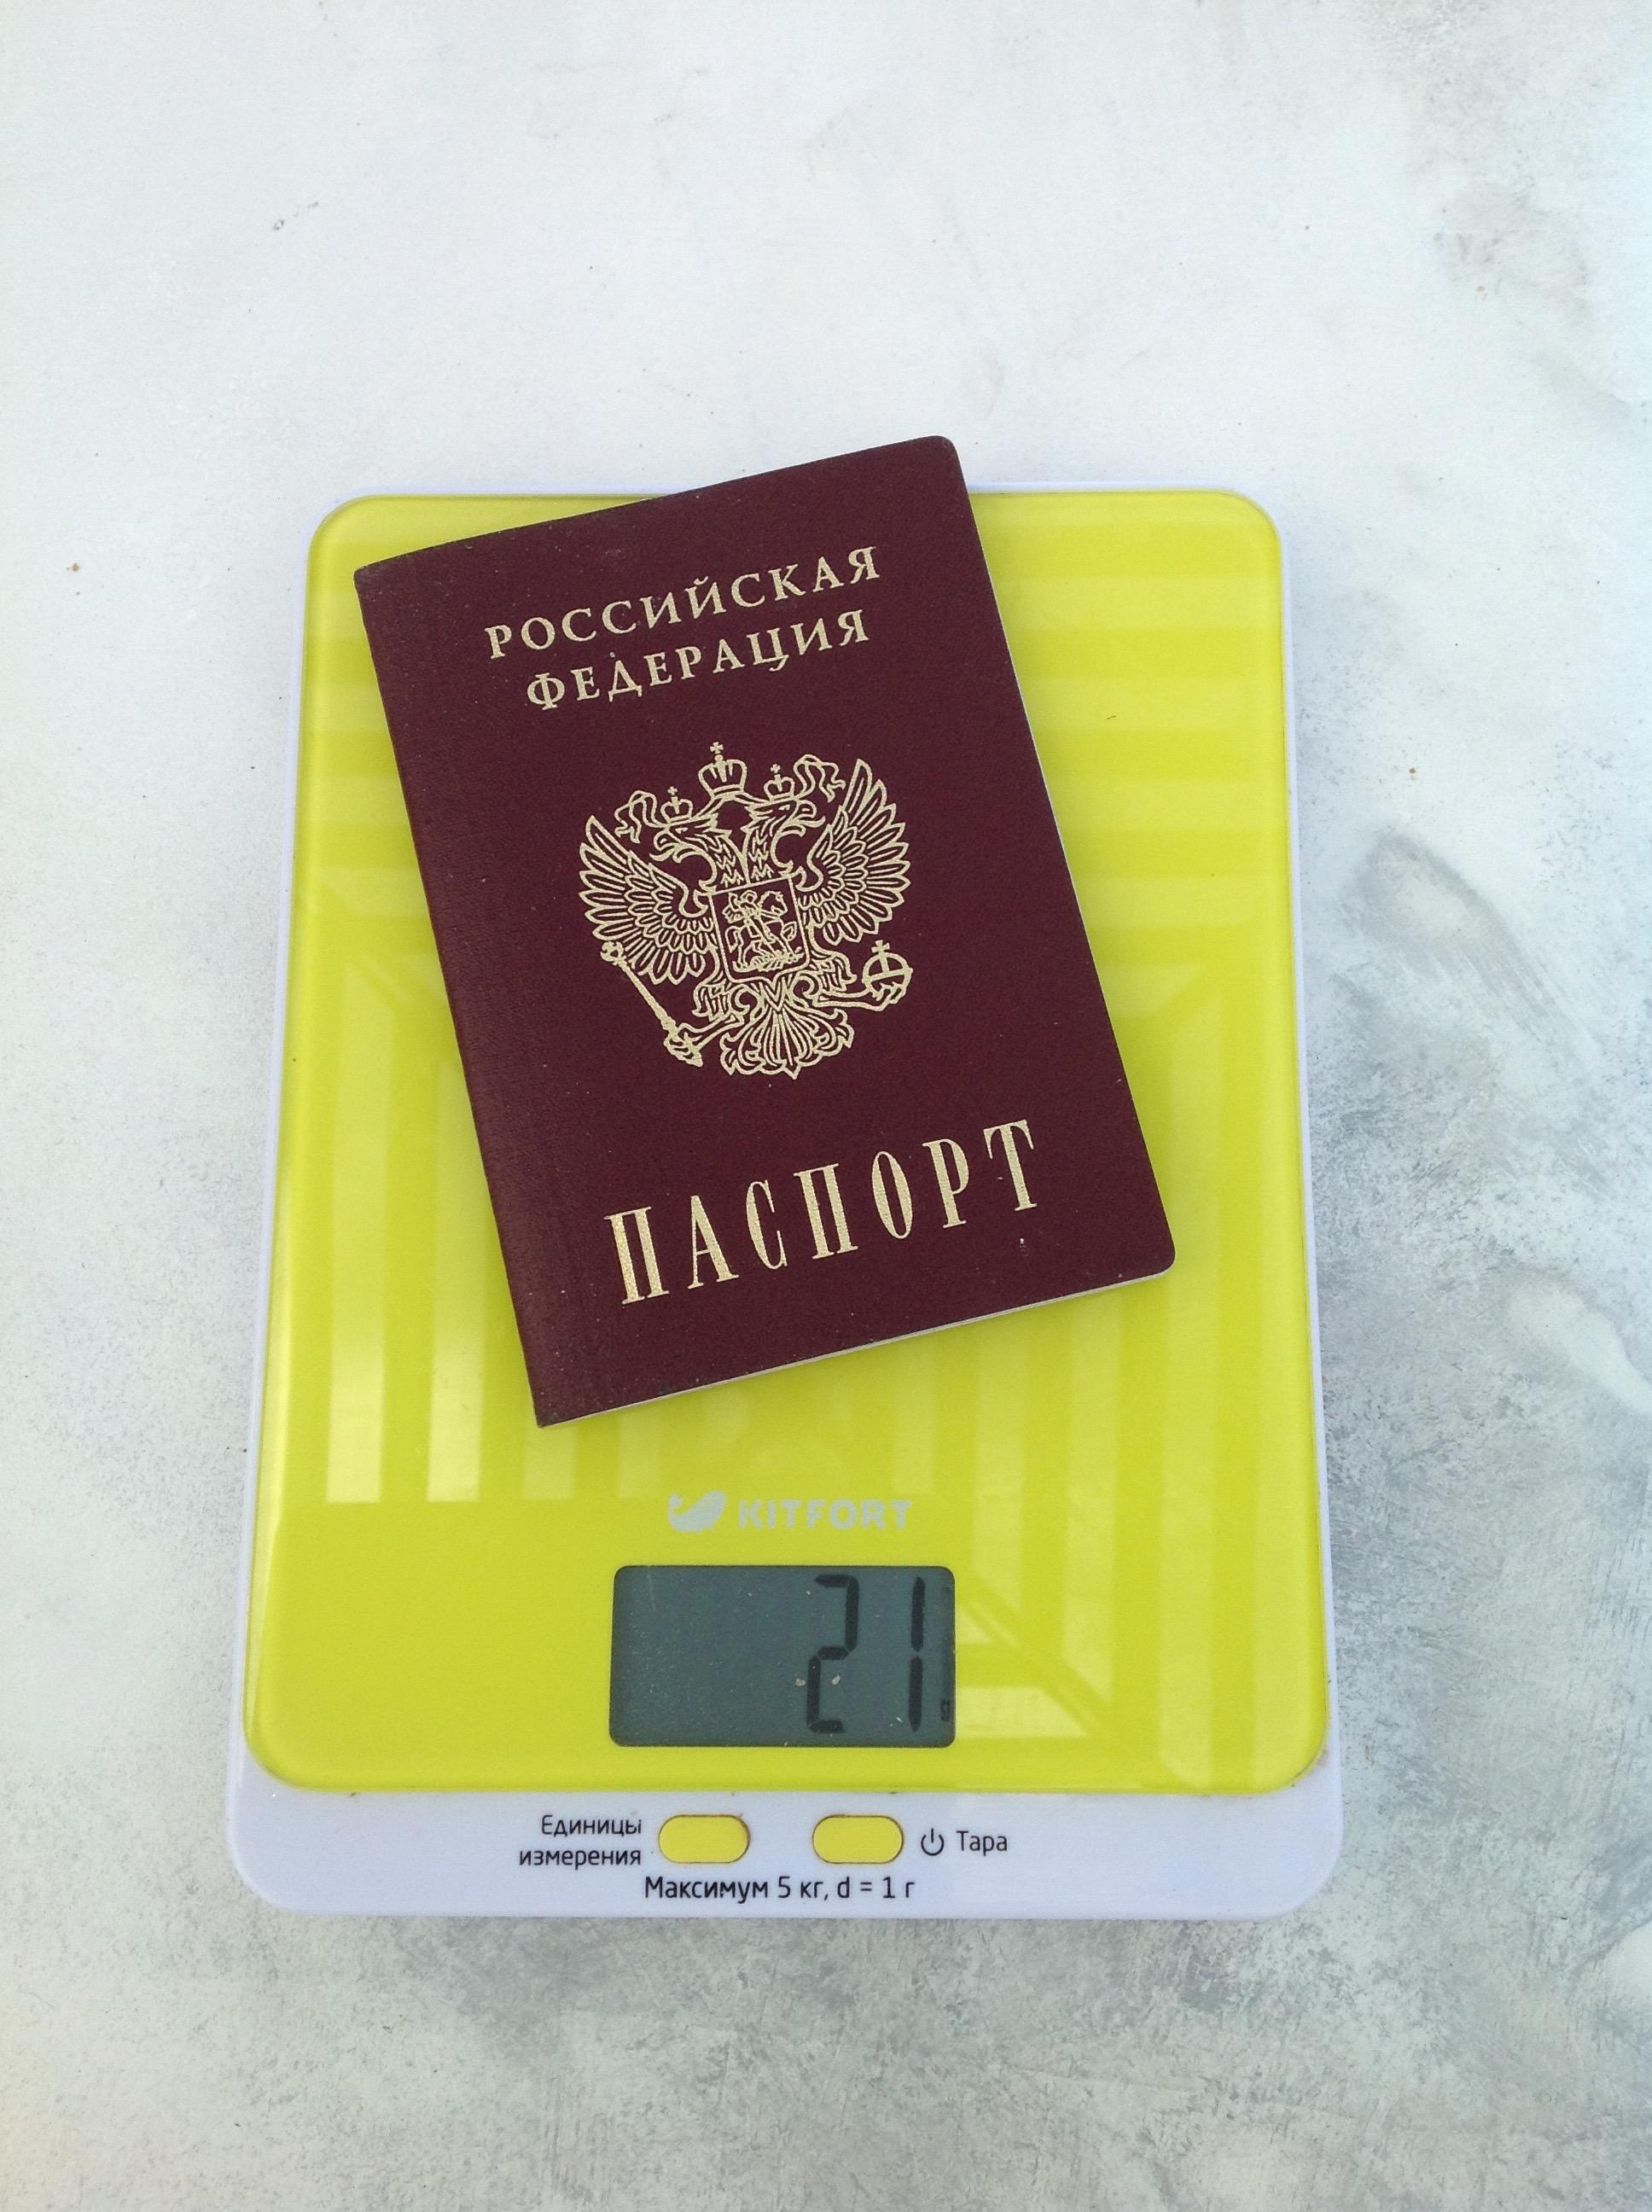 вес паспорта рф